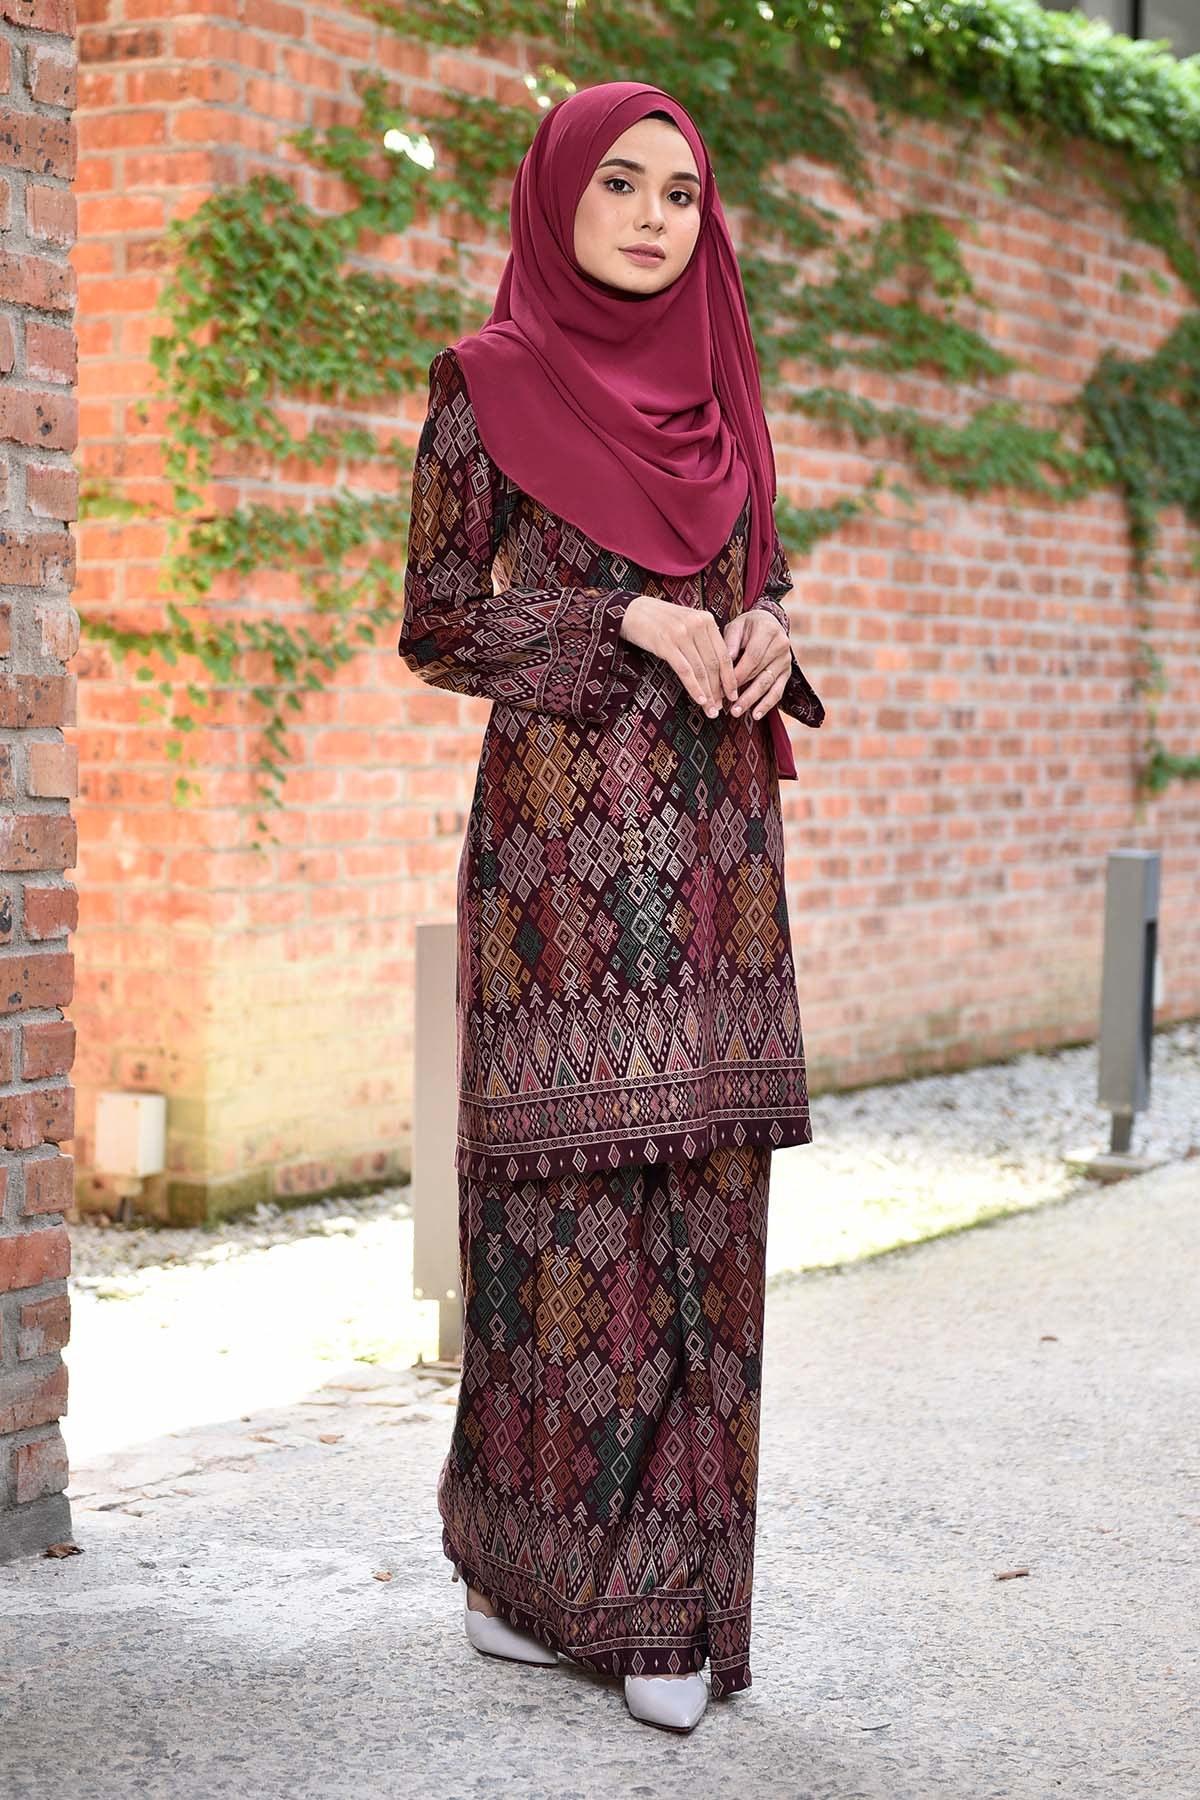 Inspirasi Desain Baju Bridesmaid Hijab 9fdy Baju Kurung songket Luella Deep Maroon